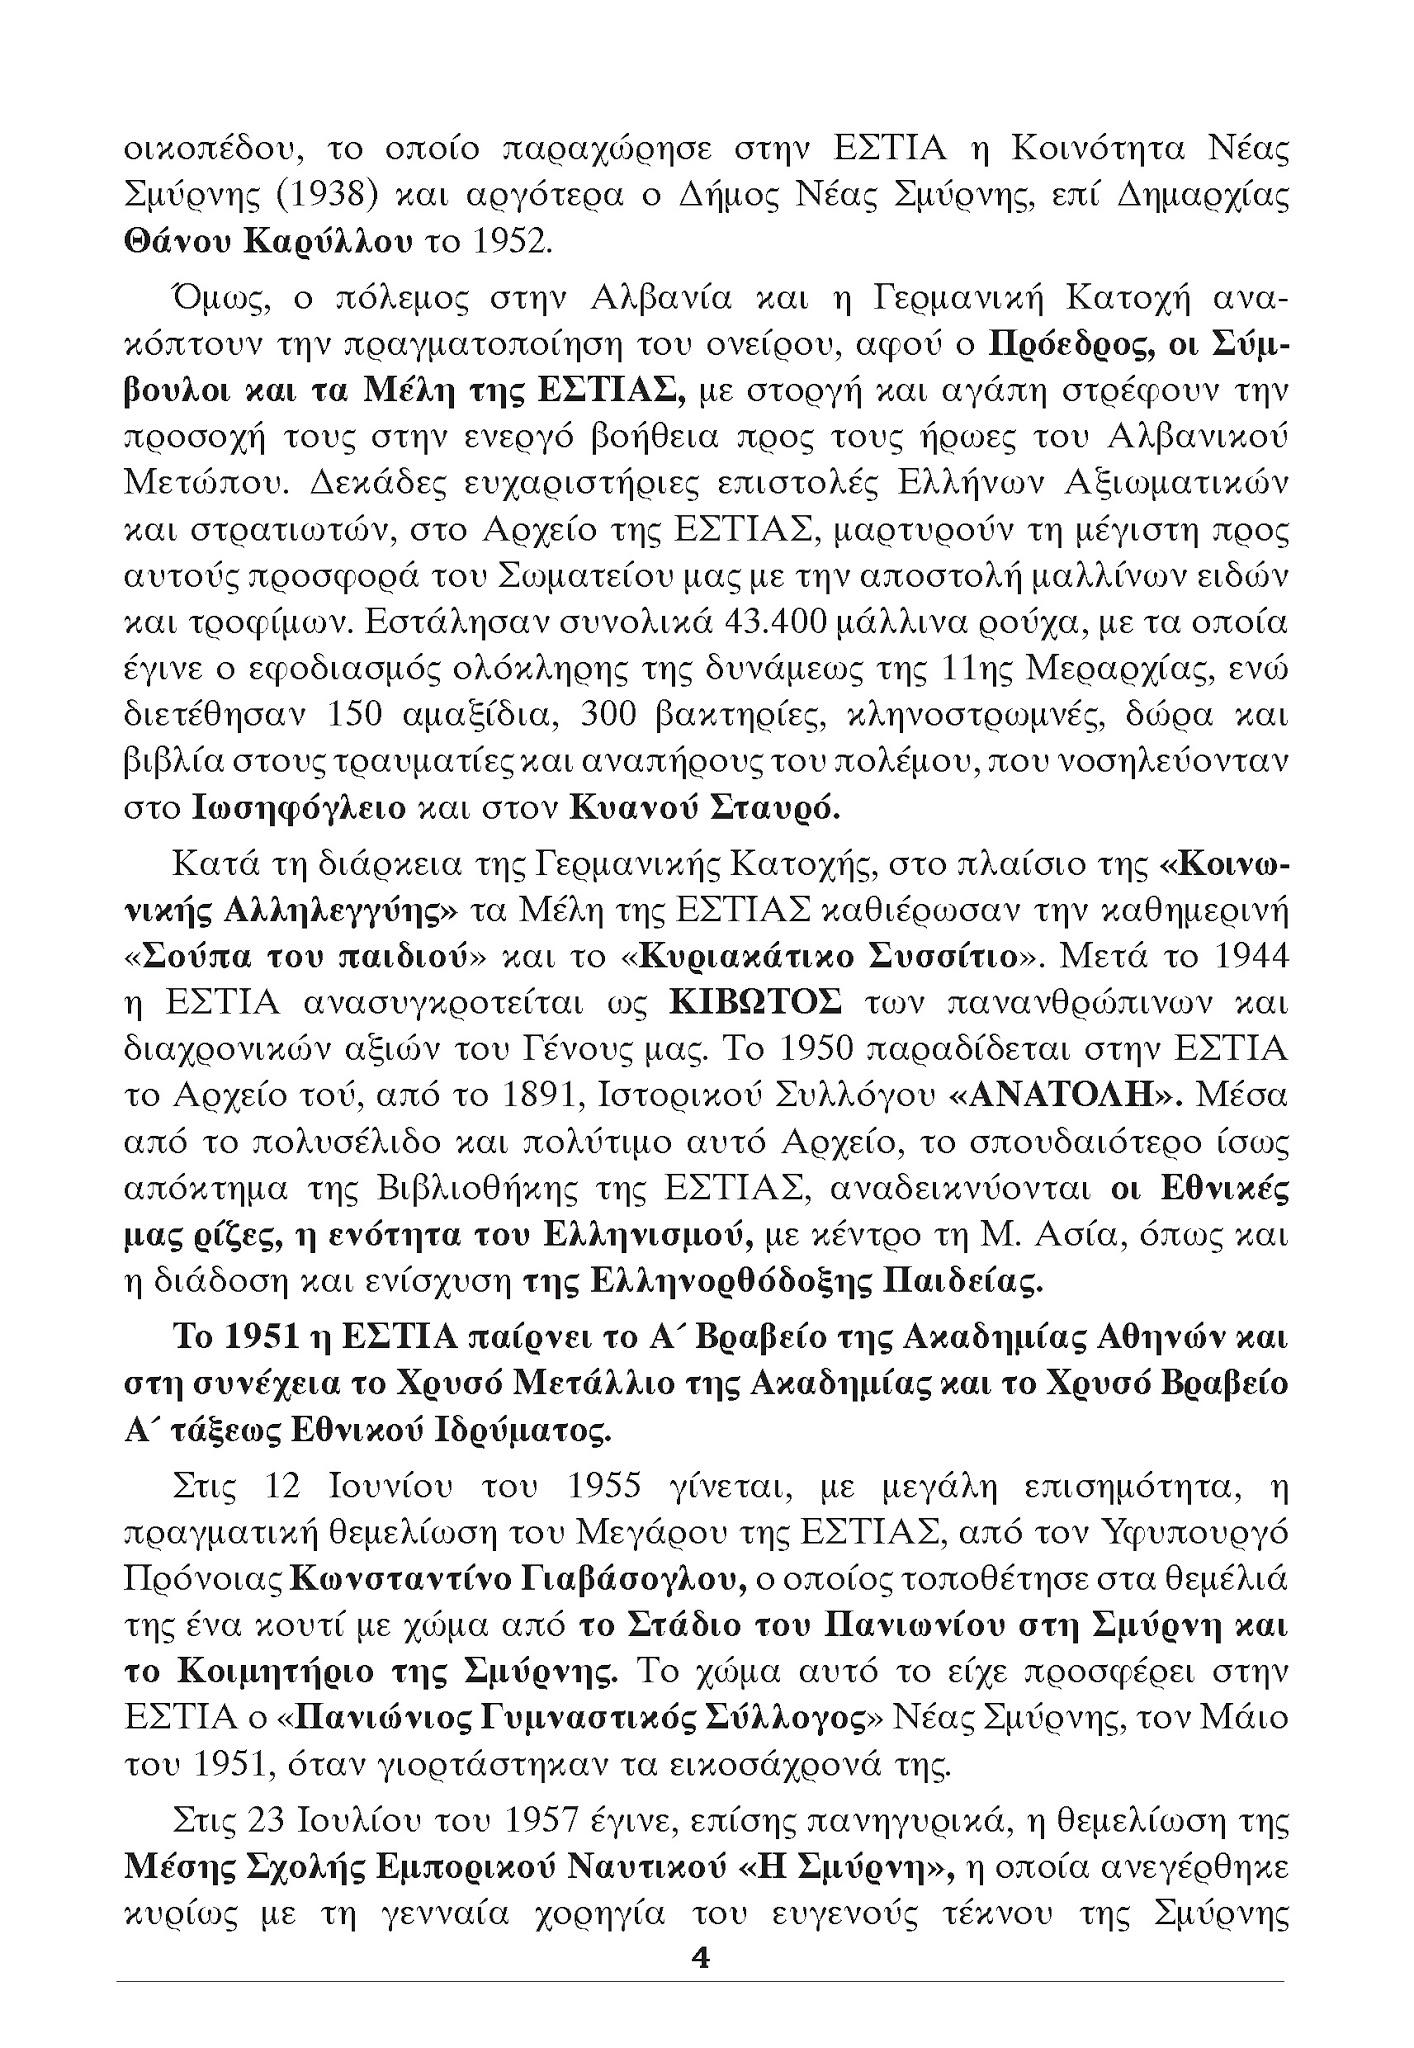 Photo: ΕΣΤΙΑ ΝΕΑΣ ΣΜΥΡΝΗΣ: «Το θαύμα της Πίστης στις Αθάνατες αξίες, στον Εθελοντισμό και στη Συλλογικότητα», της Βιργινίας Χαμουδοπούλου-Κωνσταντινίδου, Γενικής Γραμματέως της Εστίας, Δεκέμβριος 2015, σελ. 4.